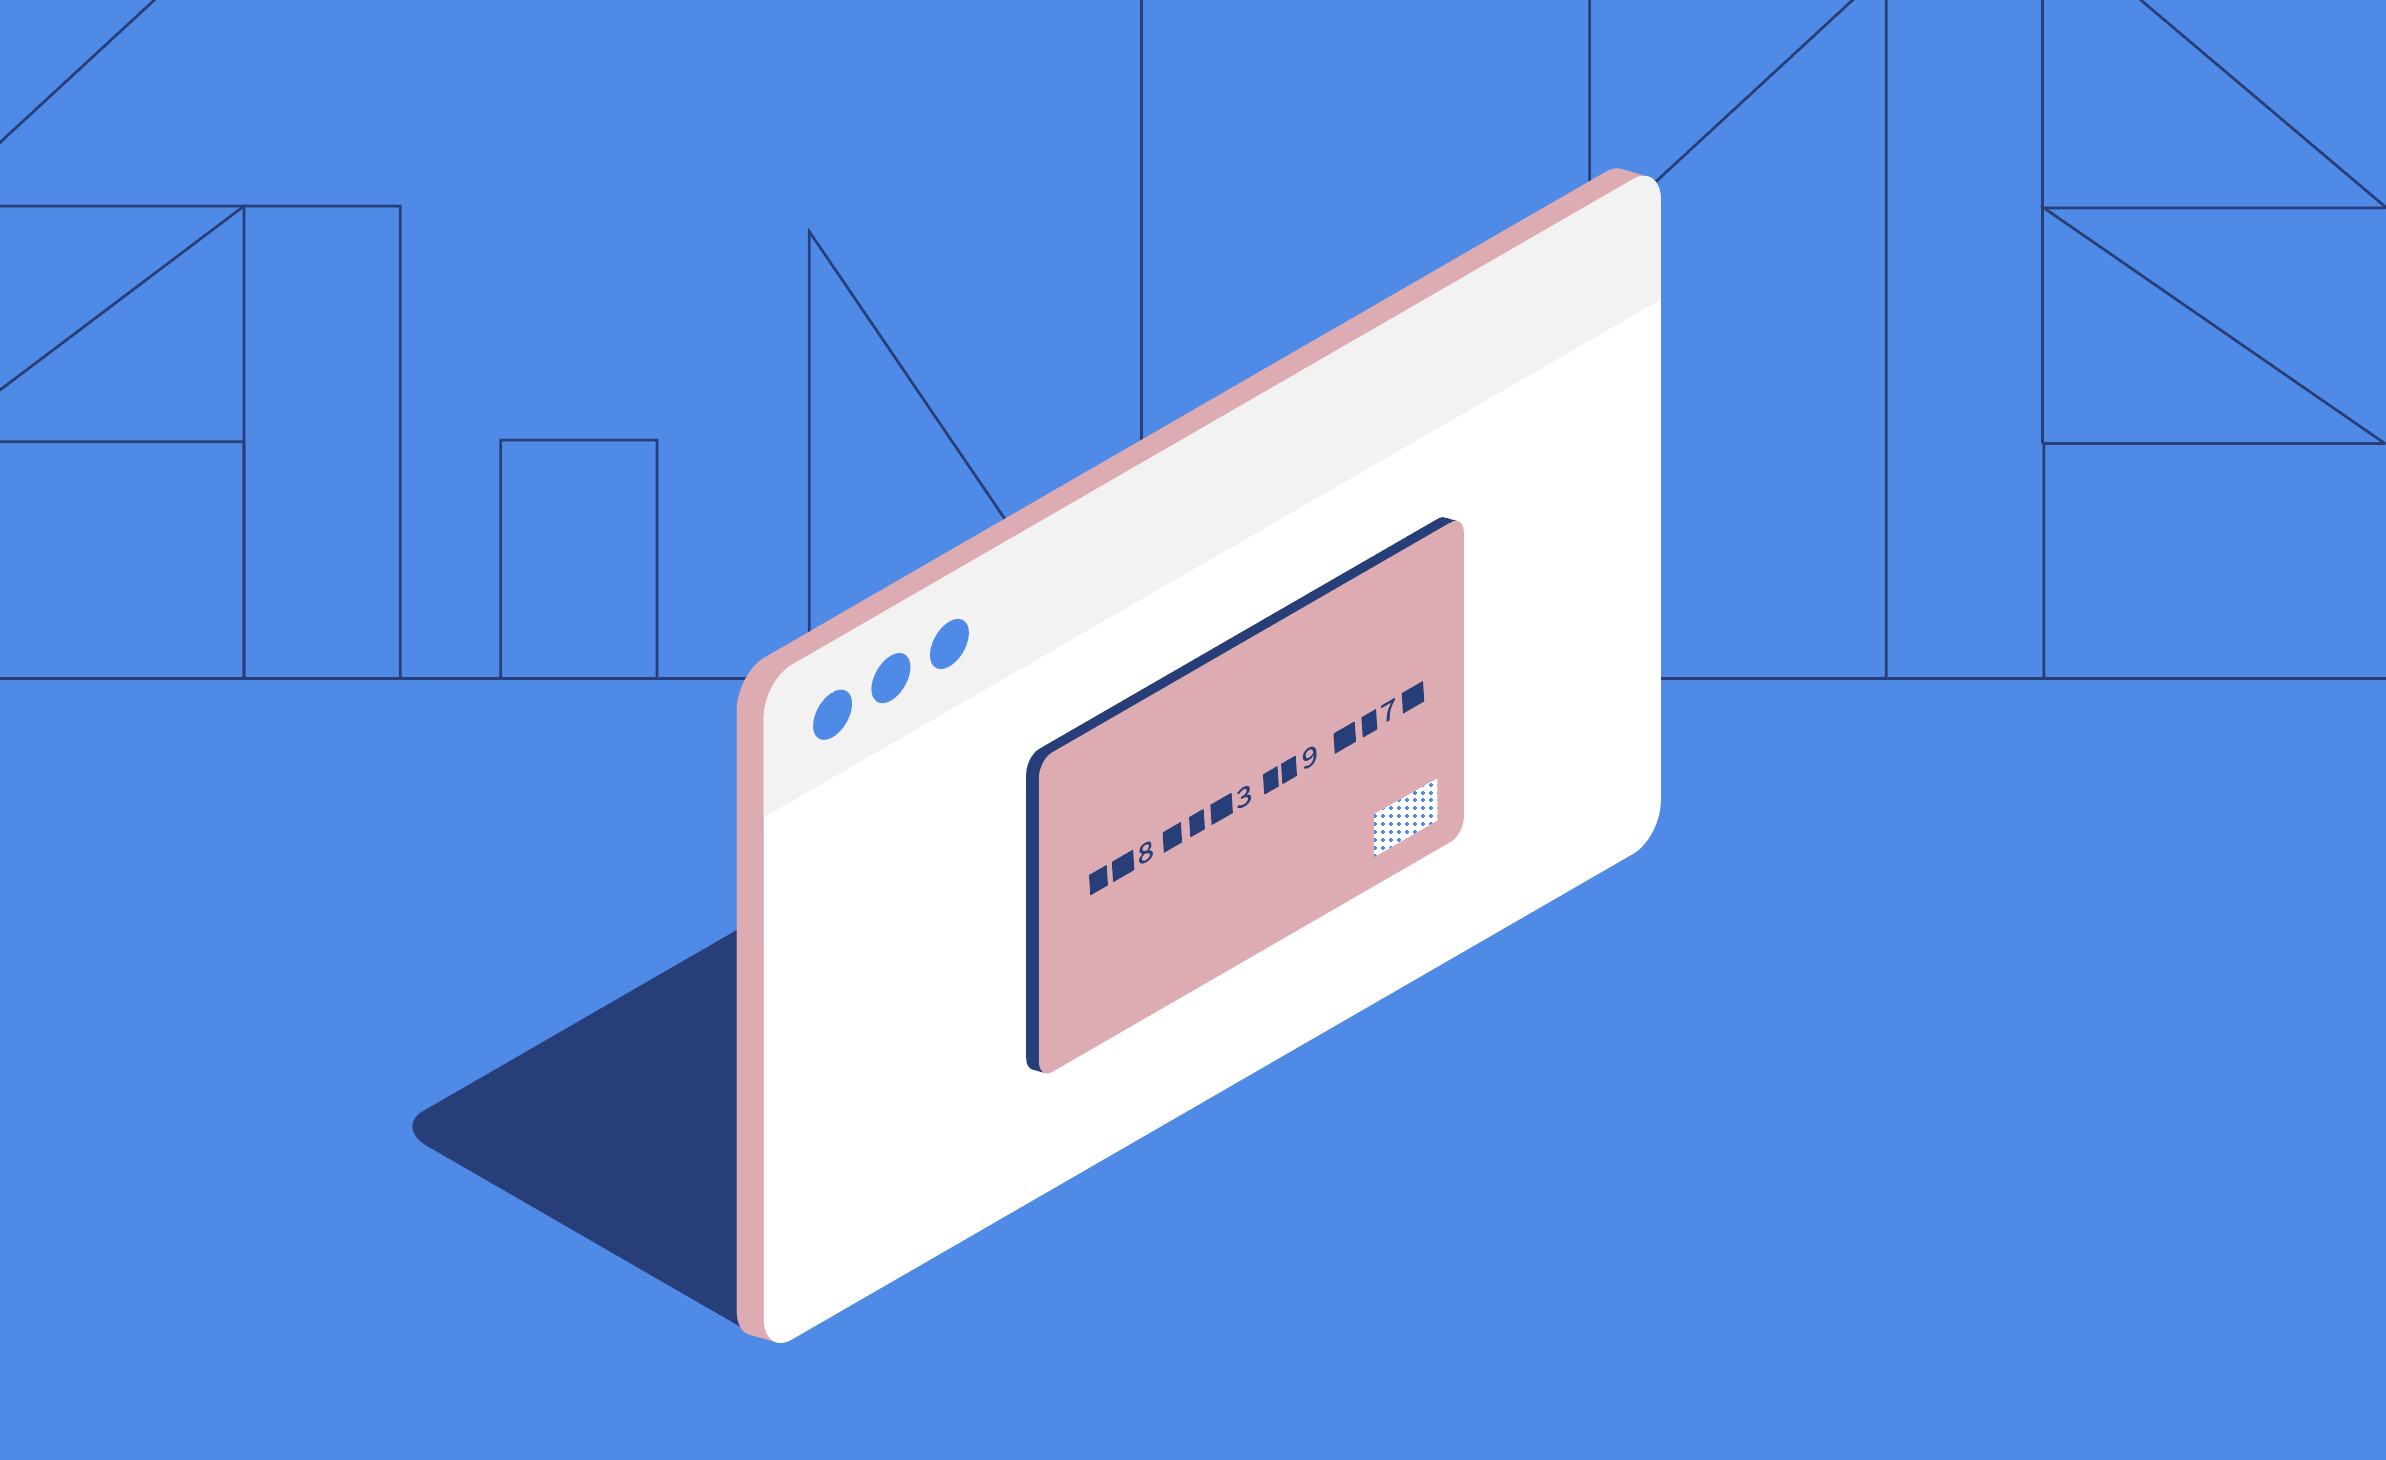 Illustrated credit card